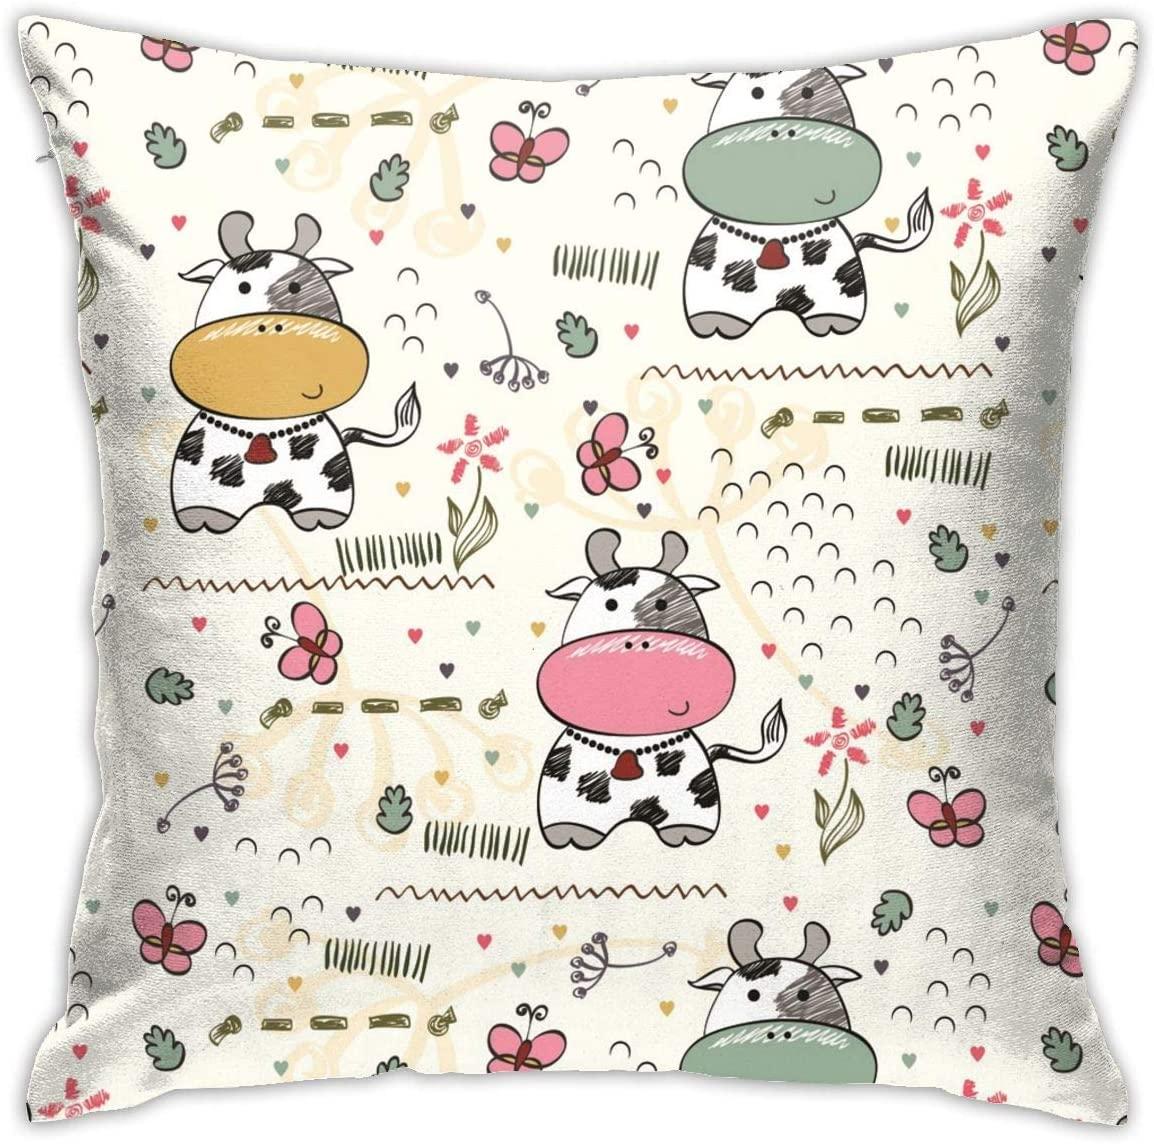 Cute Cartoon Cow Throw Pillow Cover 18X18, Double Side Design Bolster Pillowcase, Decorative Cushion Pillow Case for Car Sofa Theme Brithday Party Bedroom Decor Kid Girls Boys